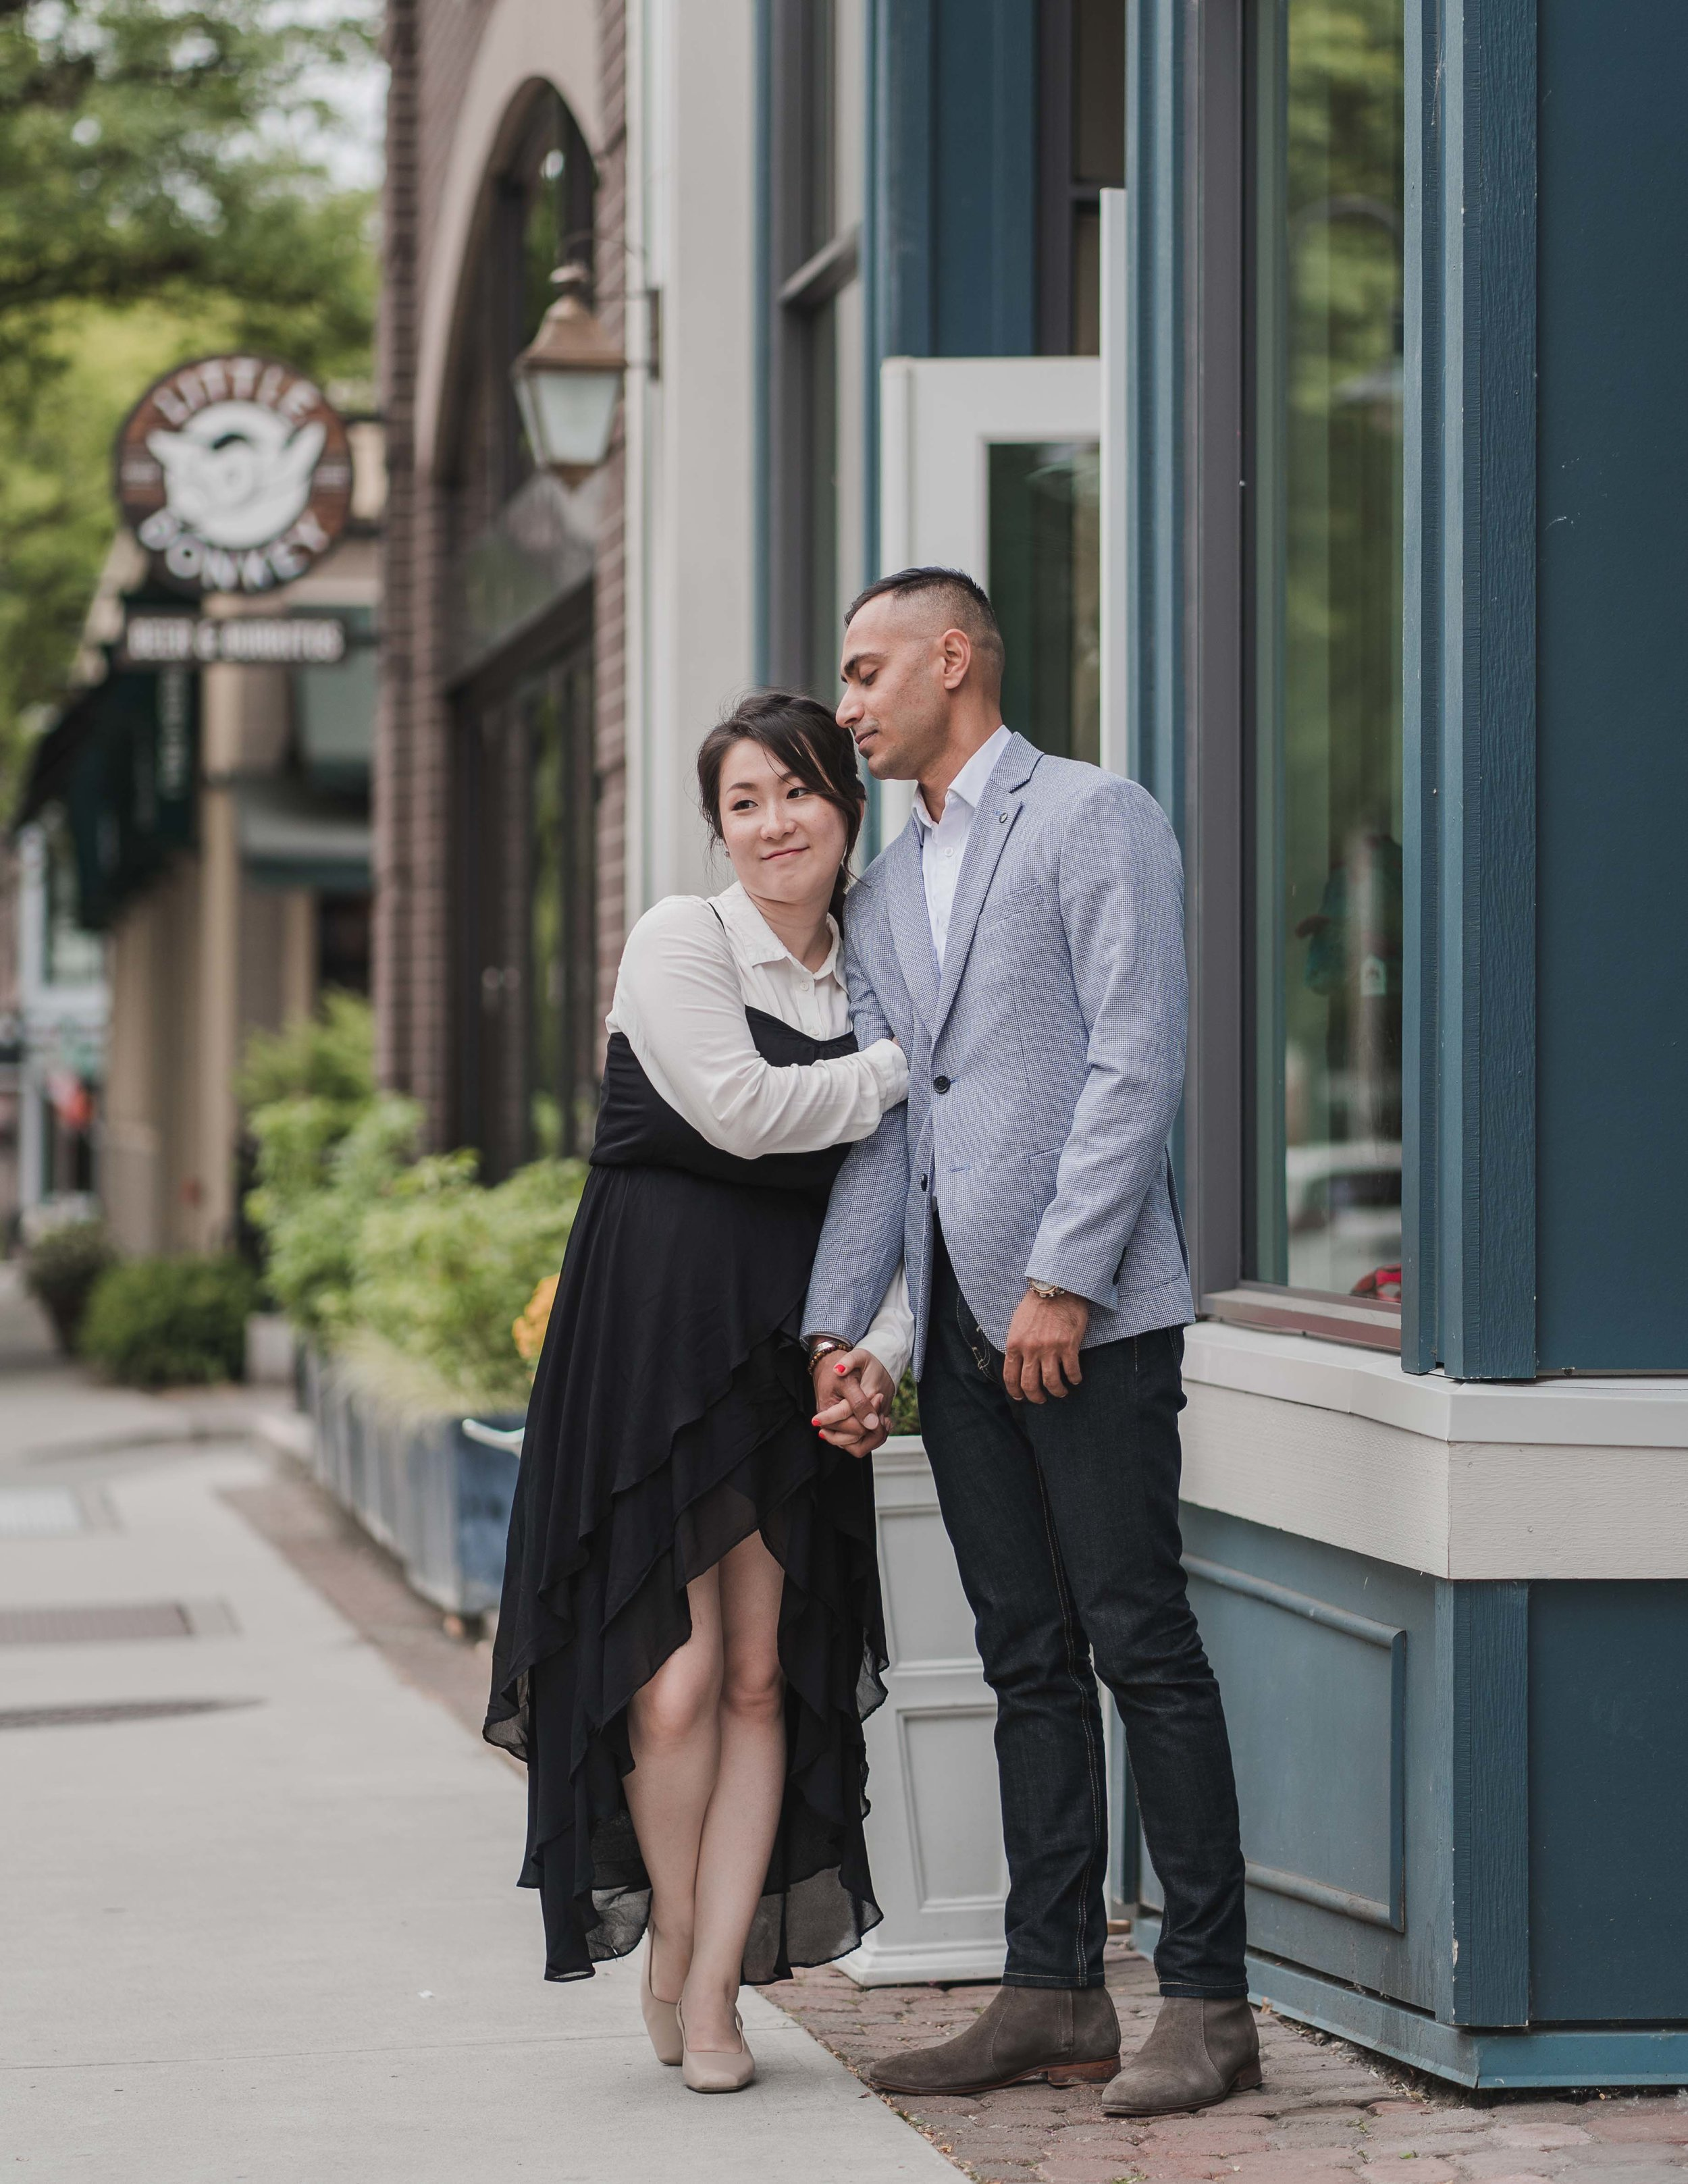 20190622 - Monika & Johnson Engagement - 0212.jpg